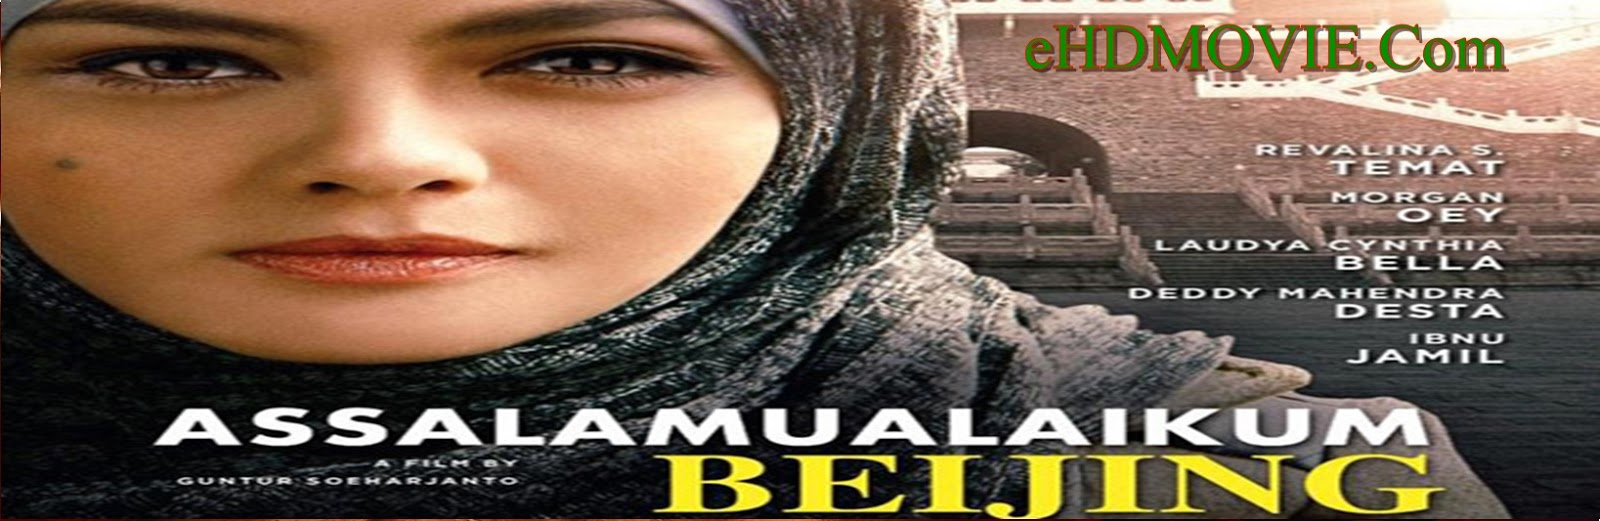 Assalamualaikum Beijing 2014 Full Movie Indonesia 720p - 480p ORG BRRip 650MB - 900MB ESubs Free Download